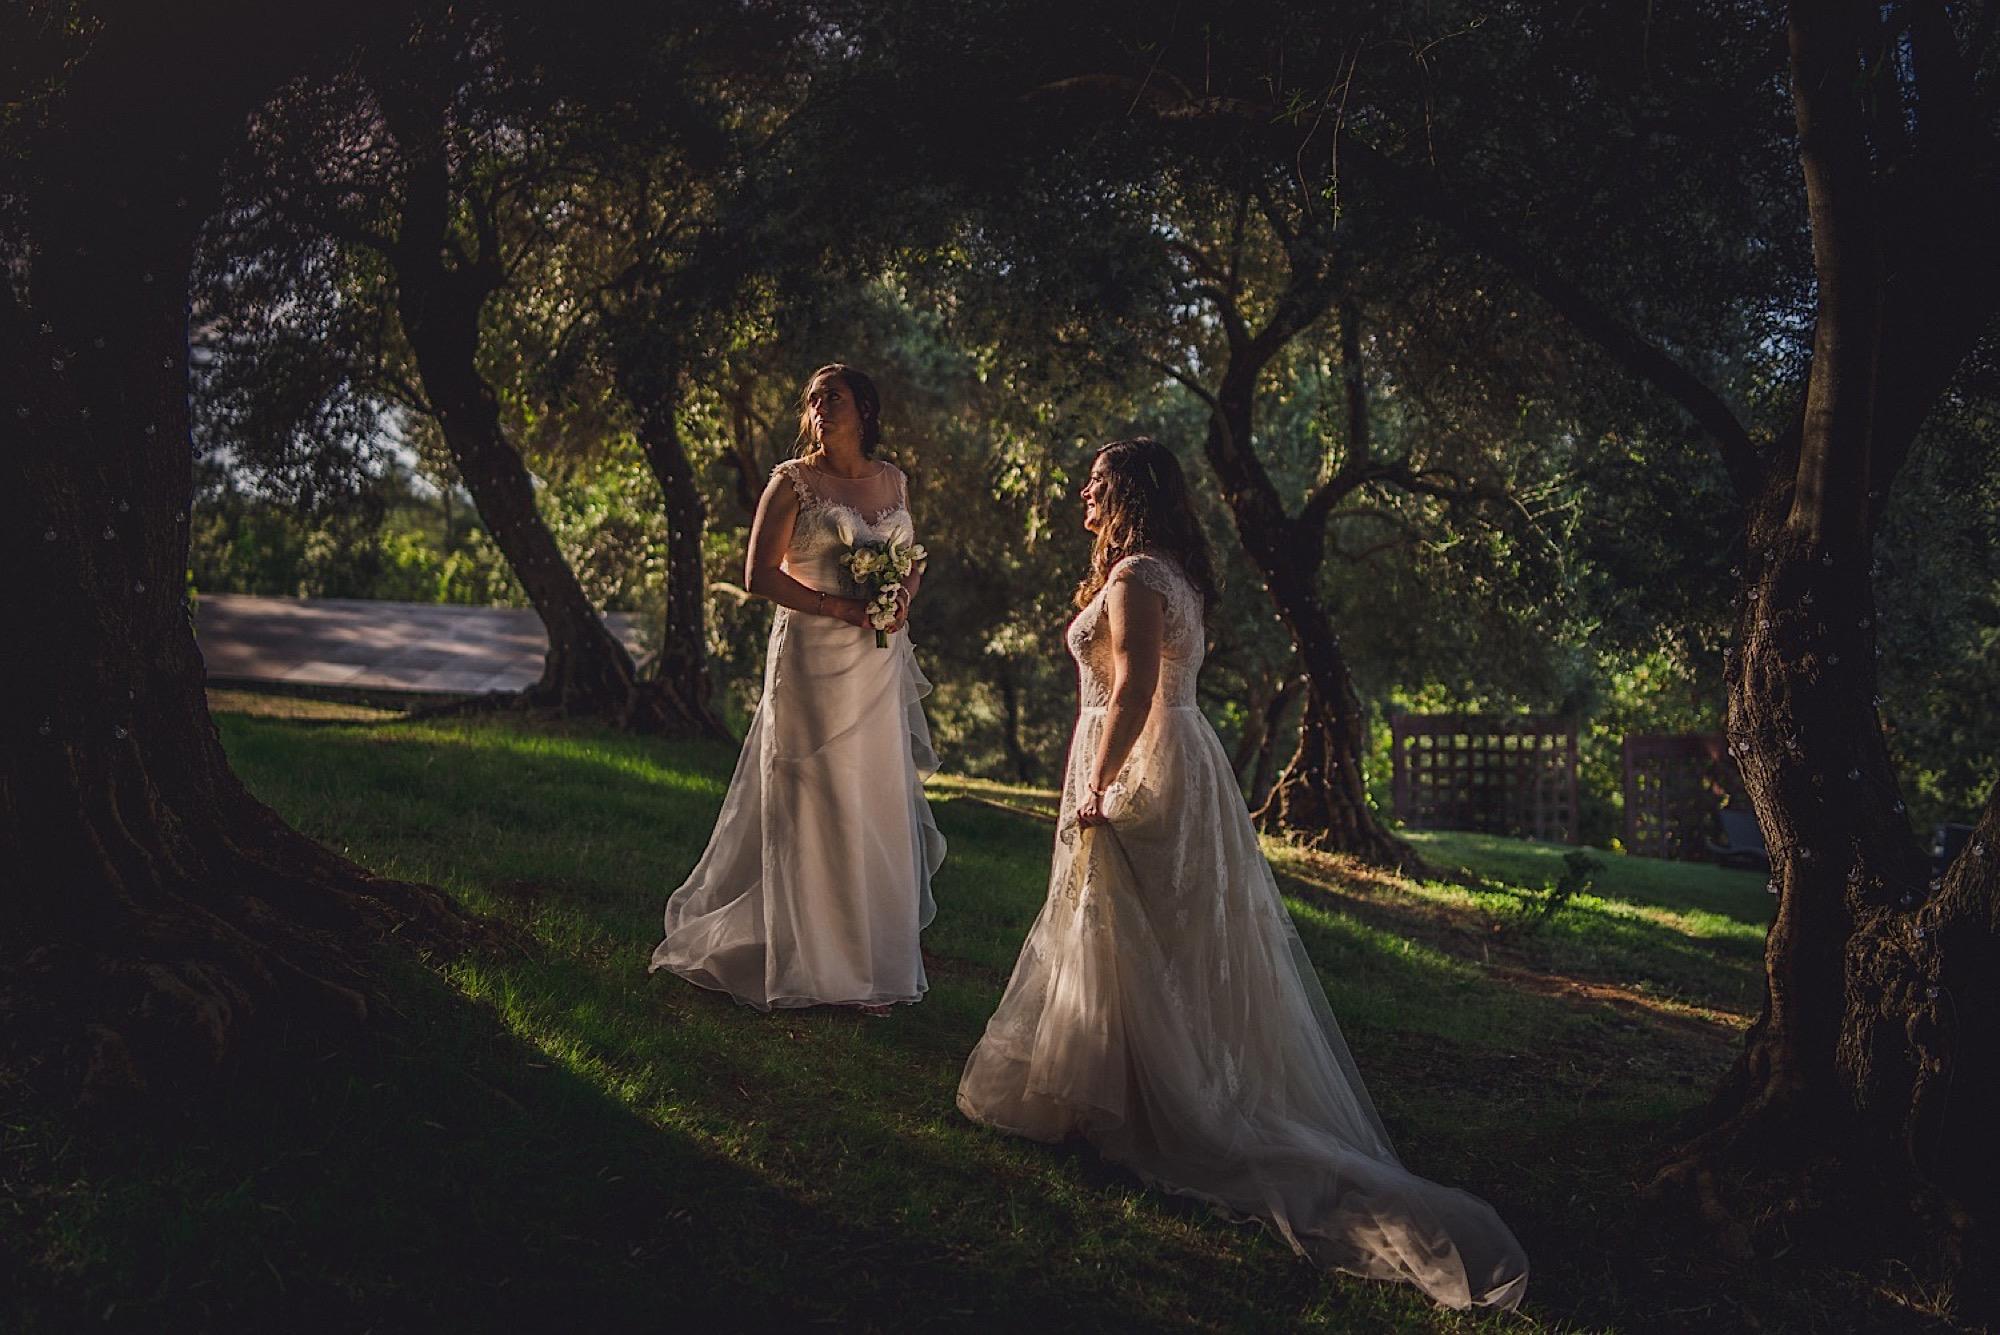 51_Same_Sex_weddings.jpg